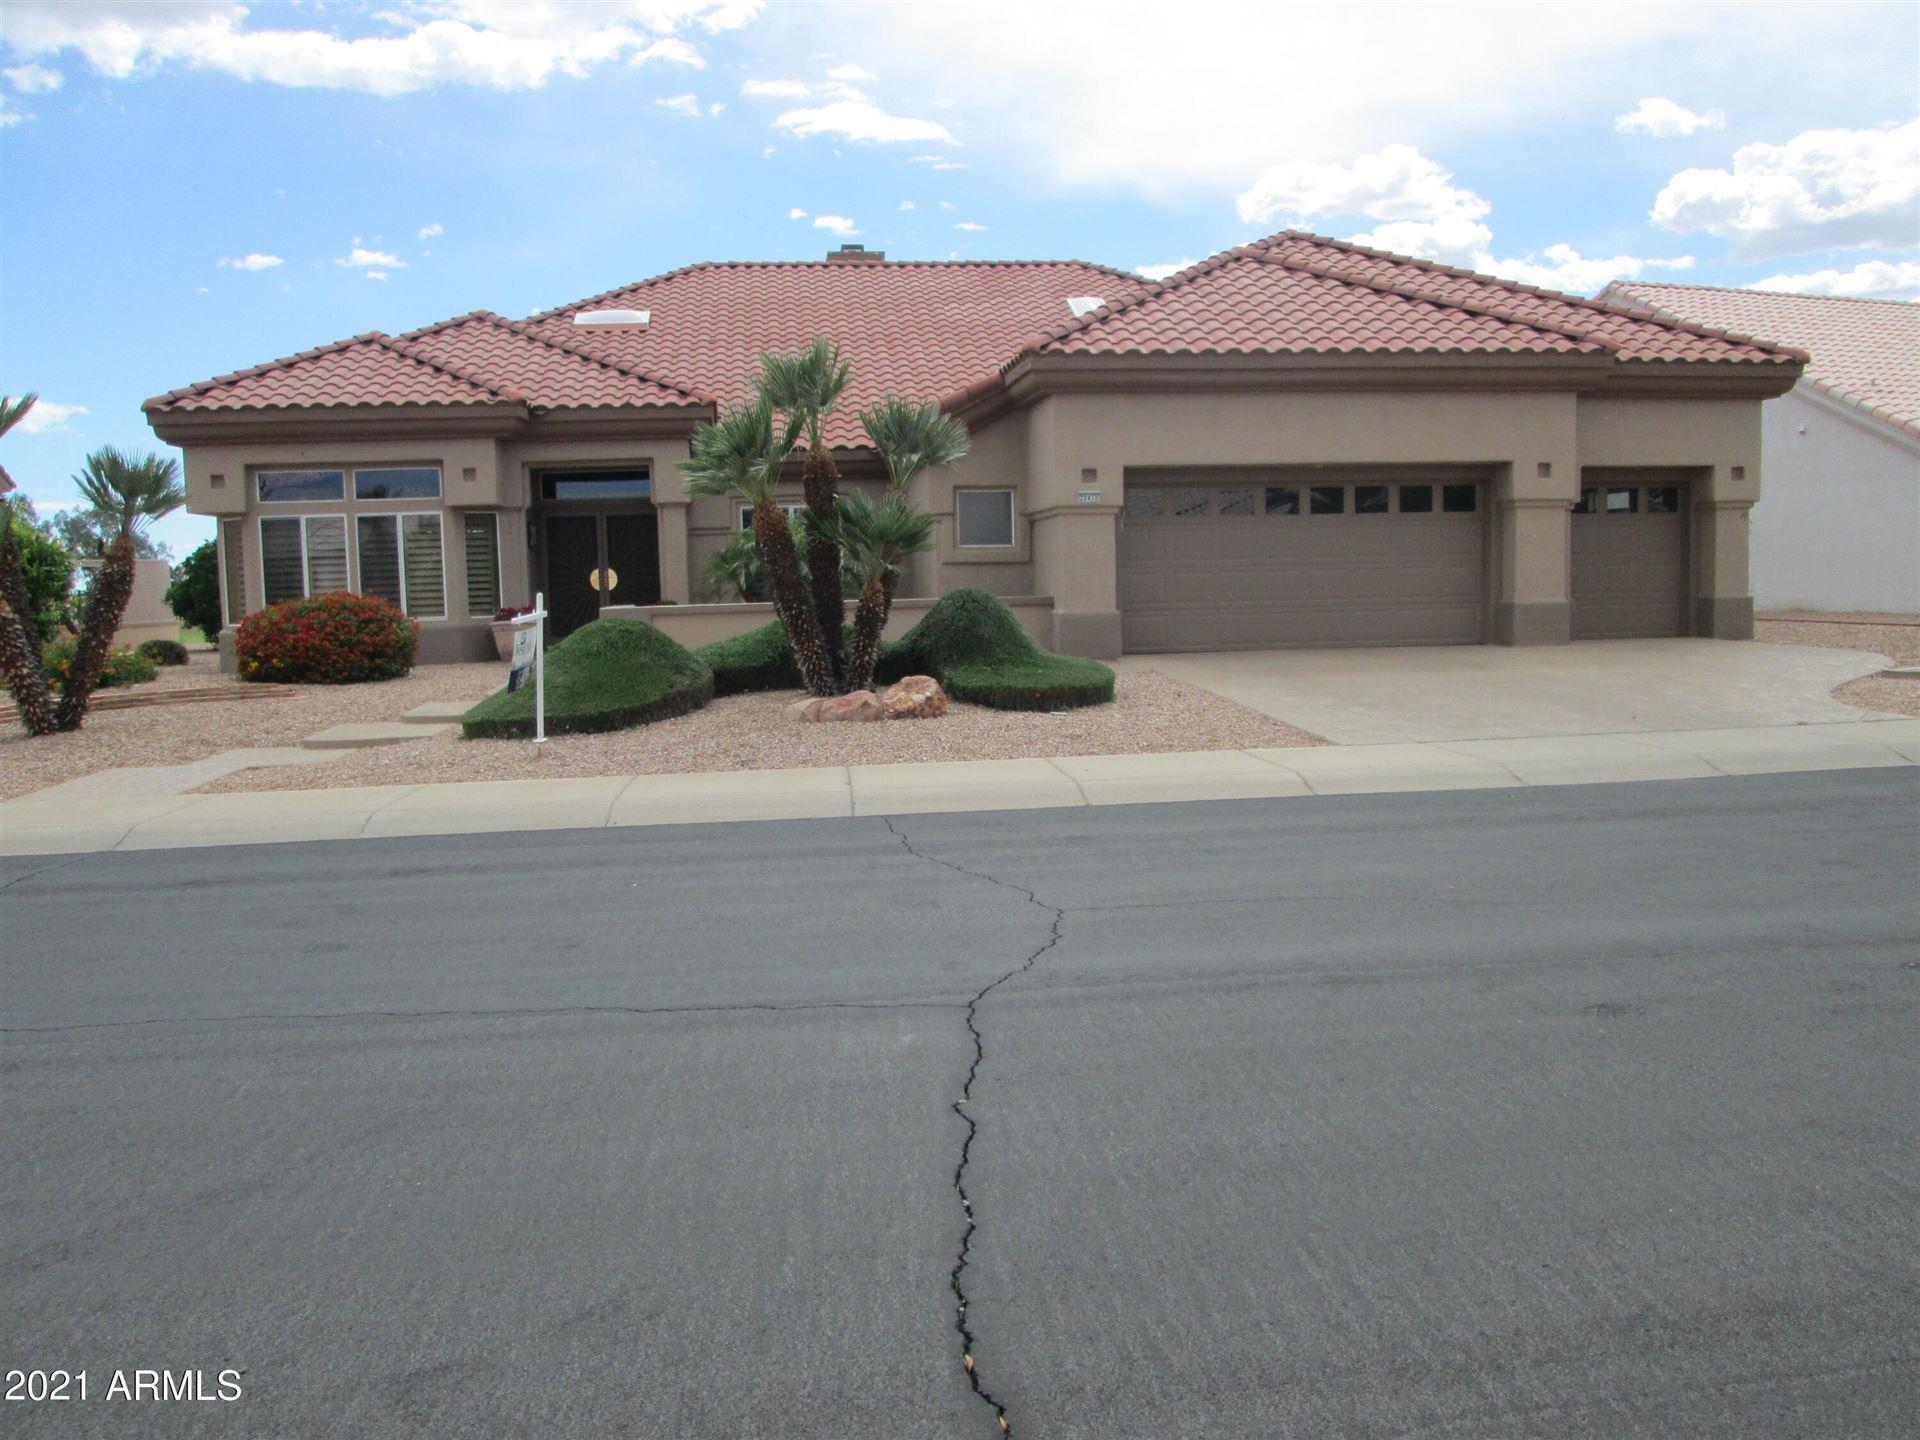 22432 N HERMOSILLO Drive, Sun City West, AZ 85375 - MLS#: 6228366